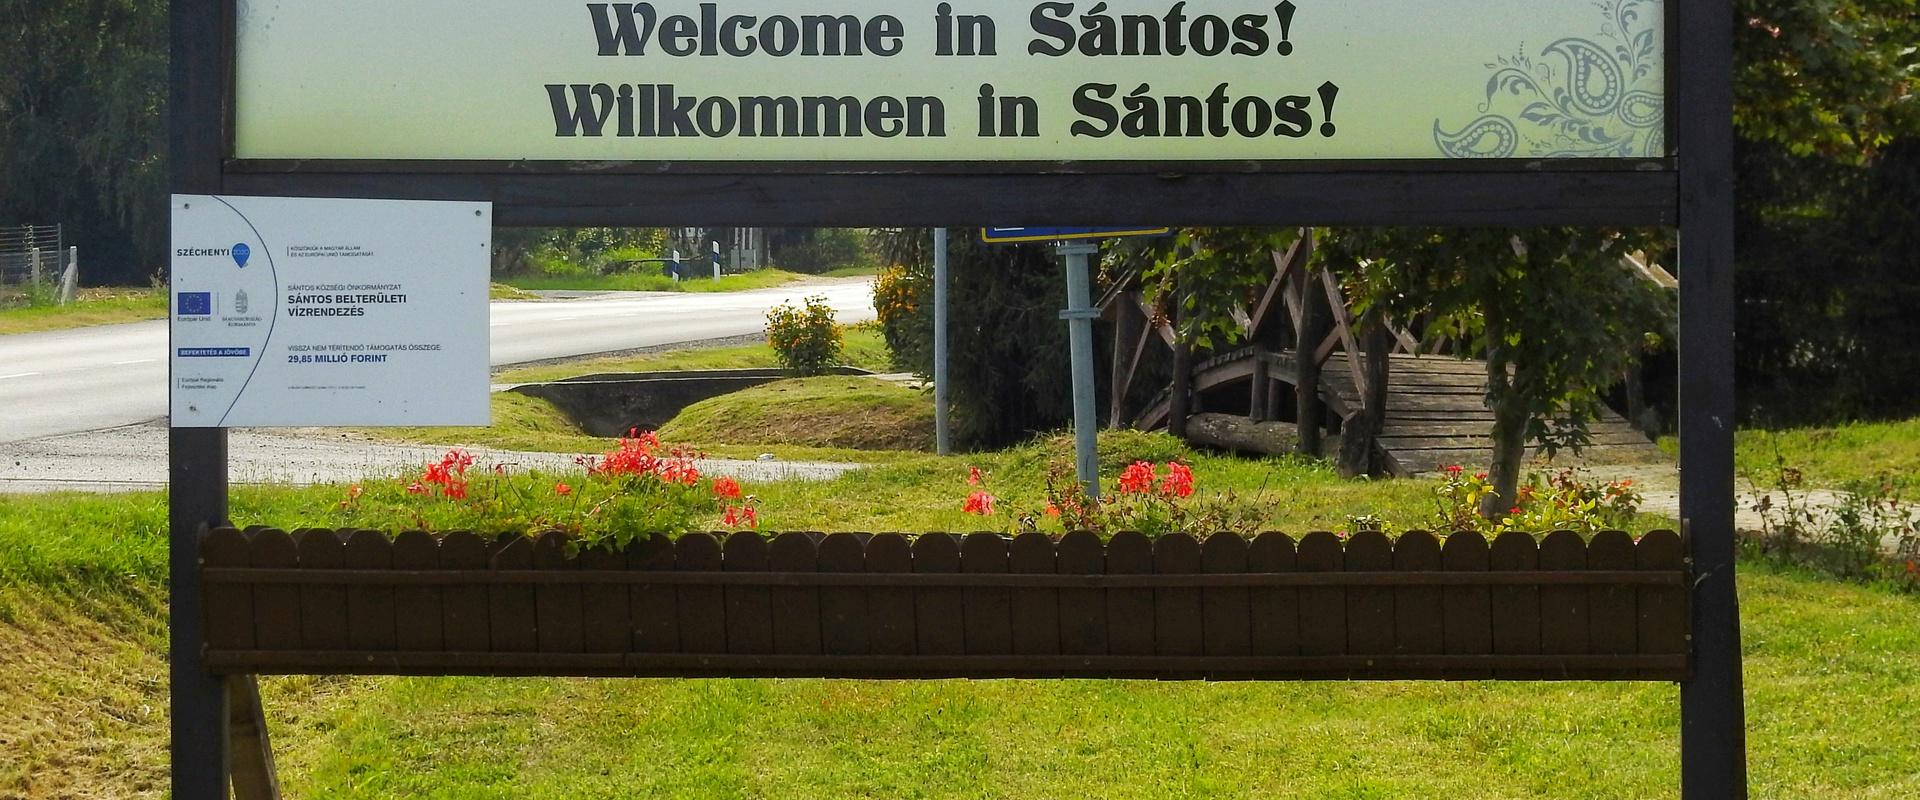 Üdvözöljük Sántoson!